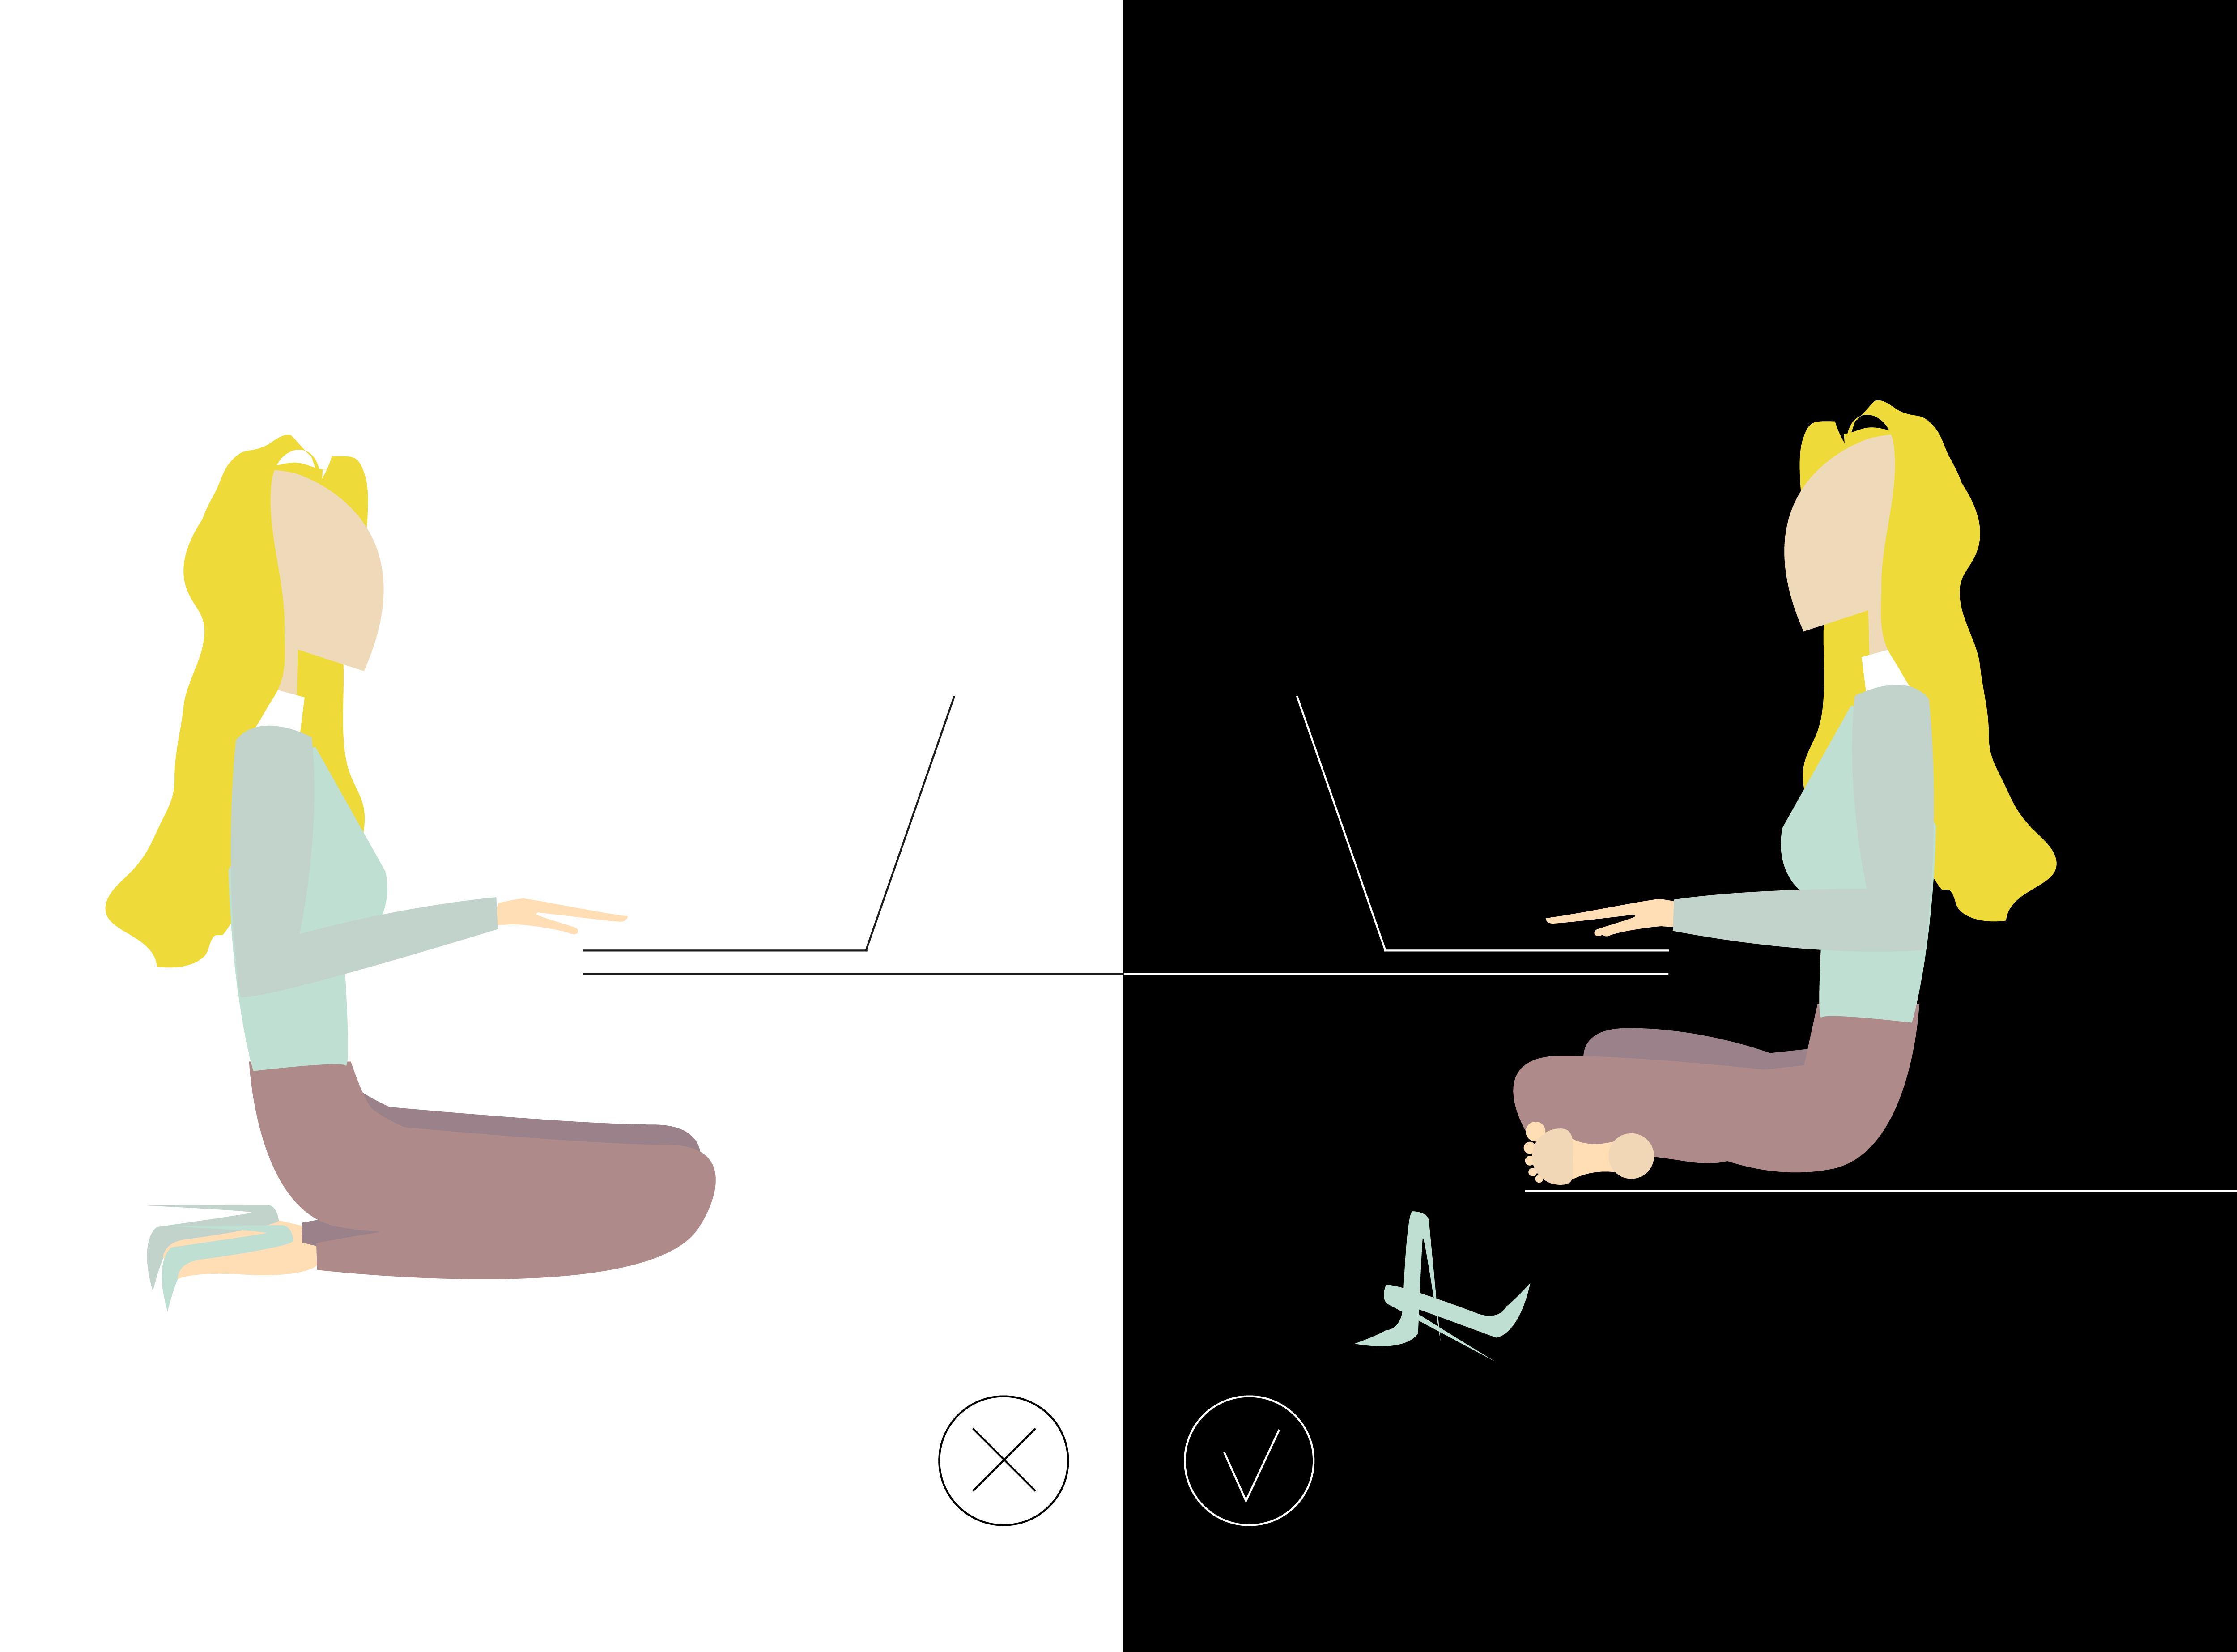 travailler assis sans avoir mal au dos kamasutra jobasutra workasutra